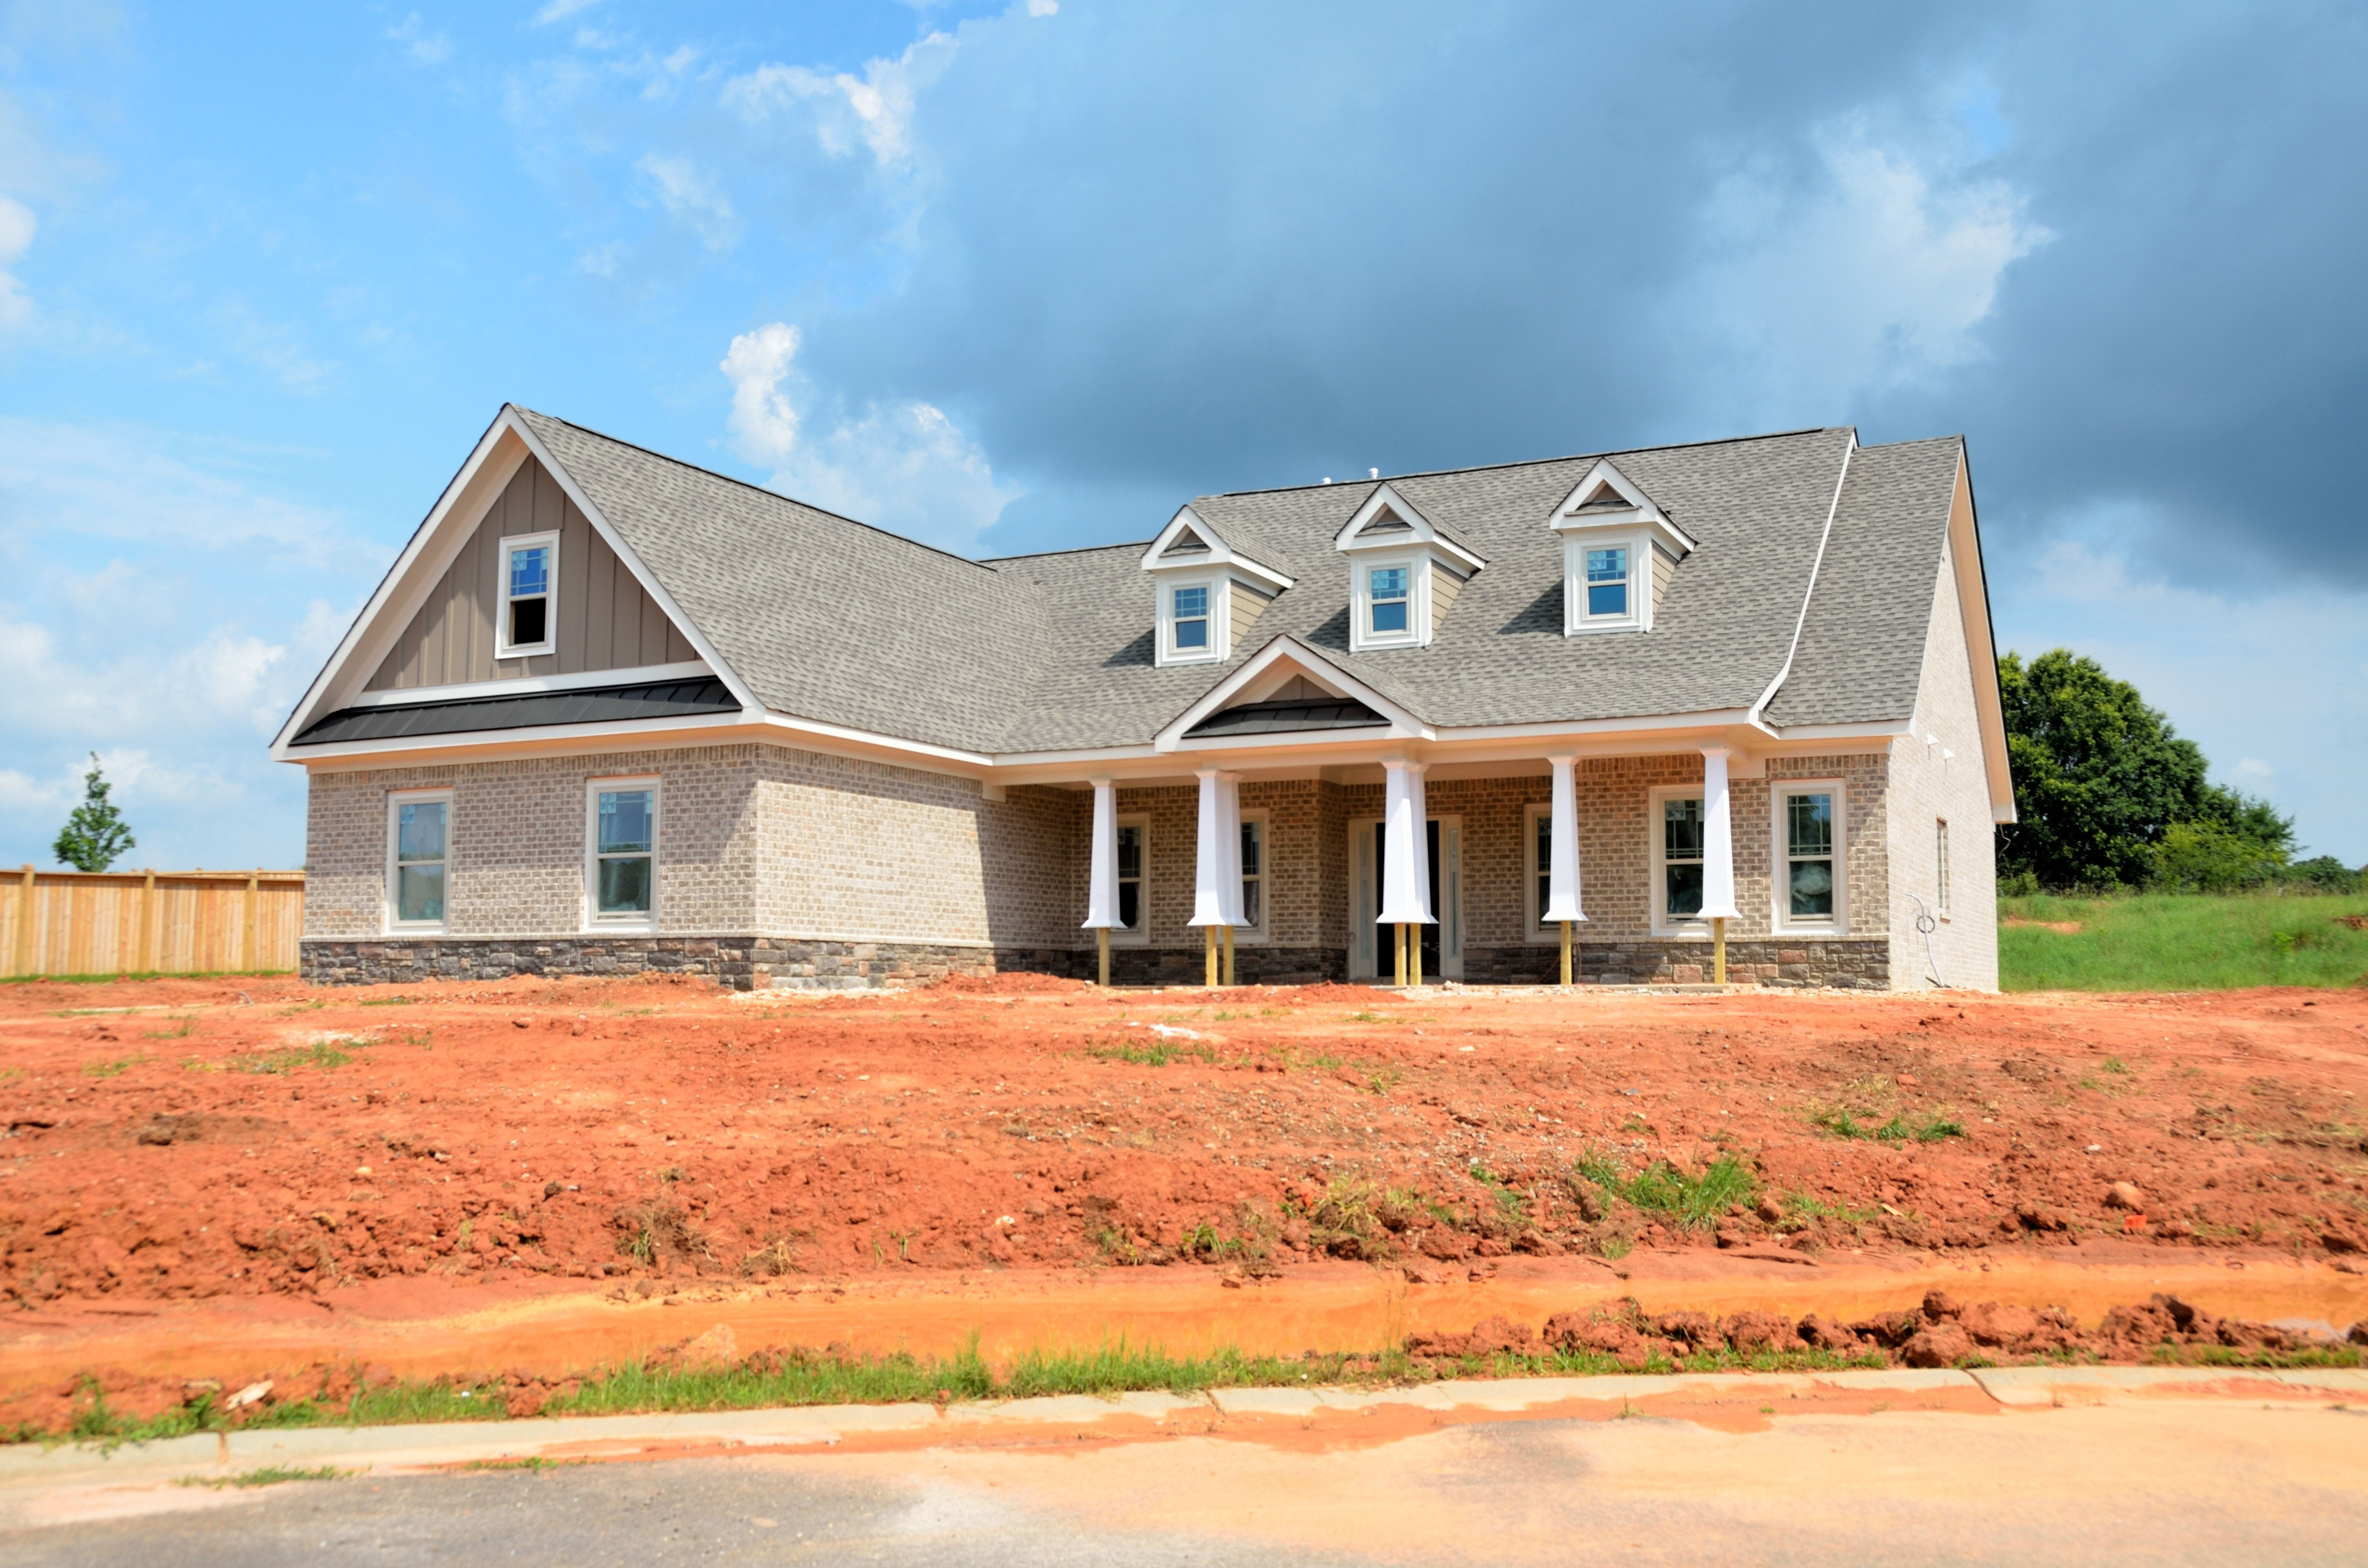 Buying New Homes Near Orlando Florida/ Central Florida Area by Todd Mowry Your Local Orlando Area Realtor